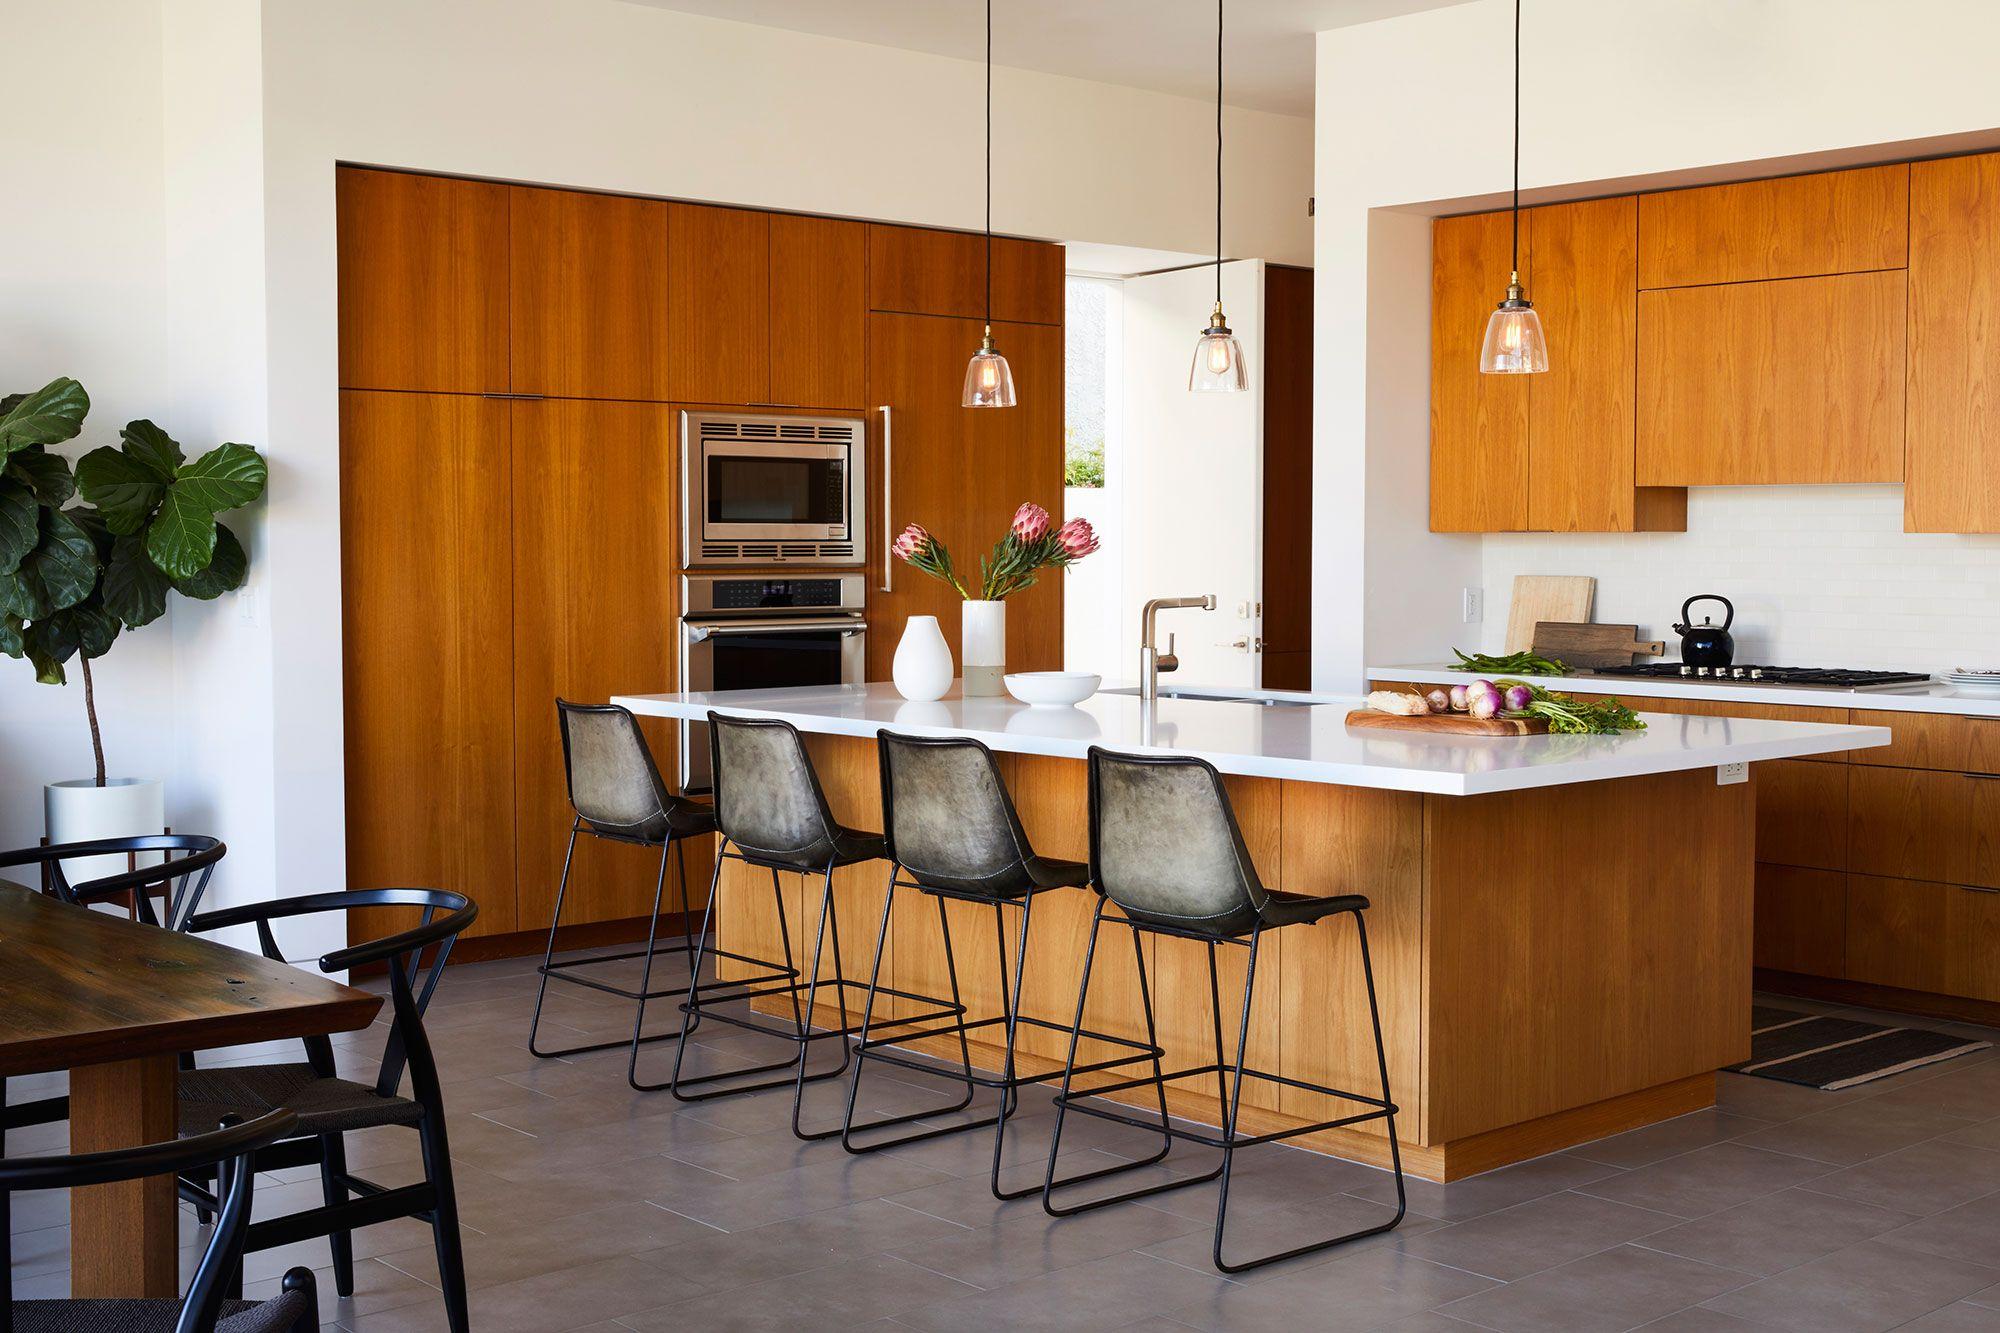 10 best modern kitchen cabinet ideas chic modern cabinet design rh housebeautiful com best kitchen cabinets design software best free kitchen cabinet design software